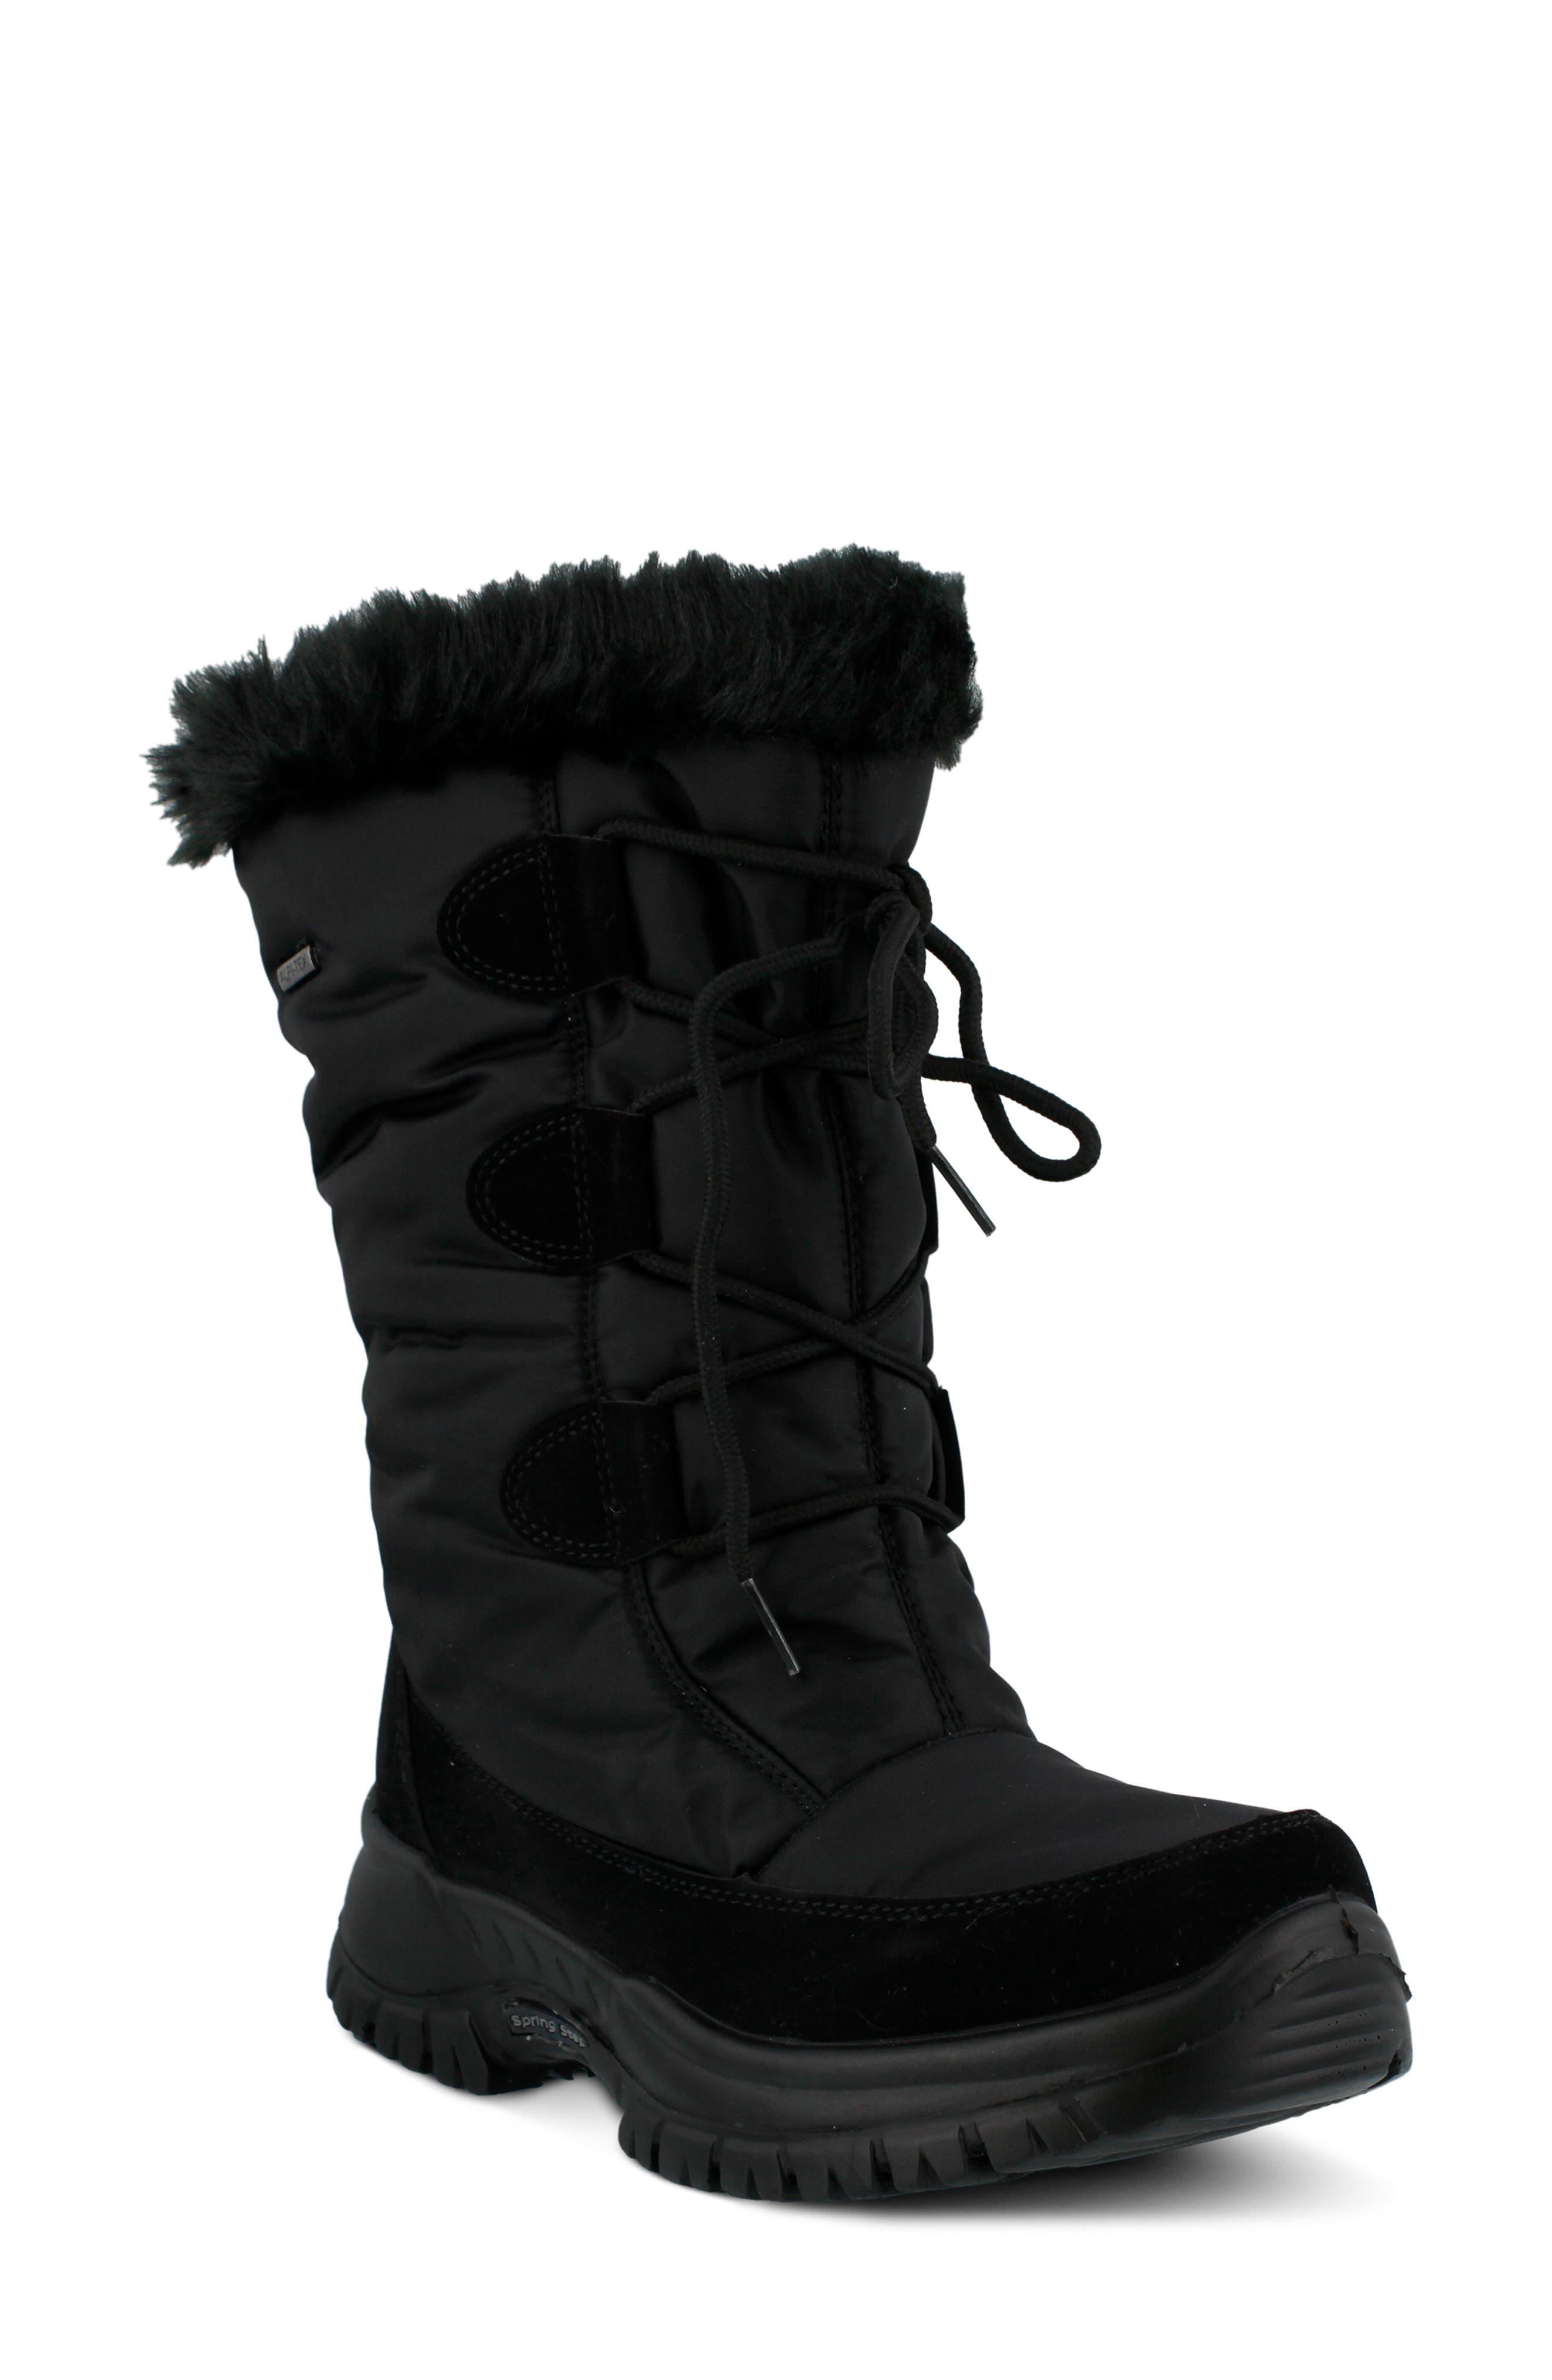 Spring Step Zurich Waterproof Faux Fur Boot - Black